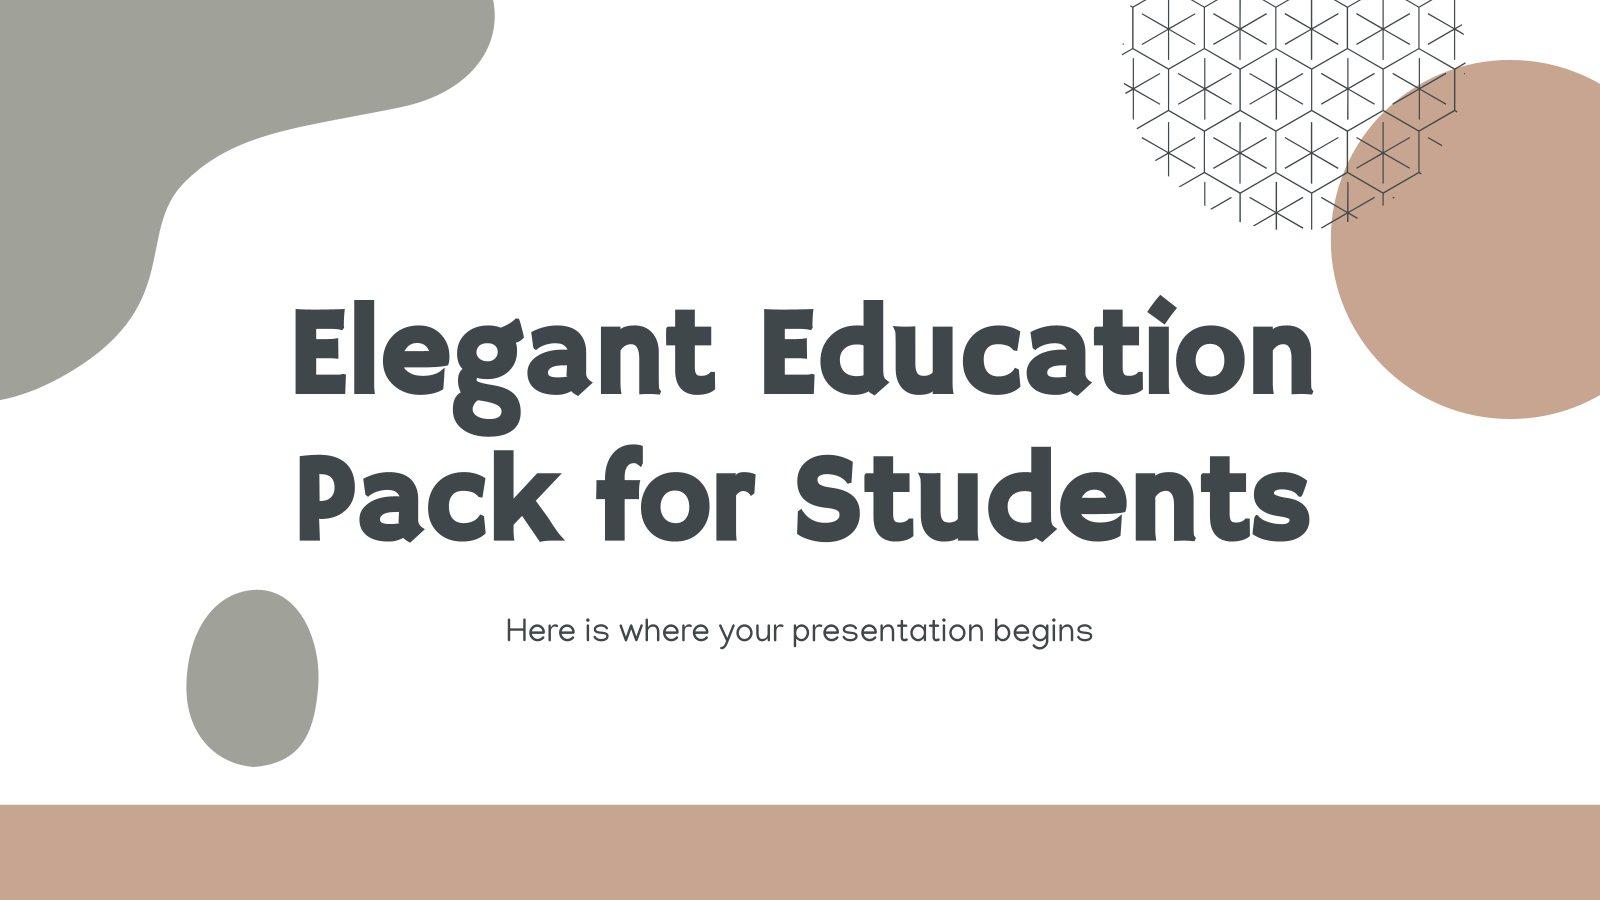 Elegant Education Pack for Students presentation template